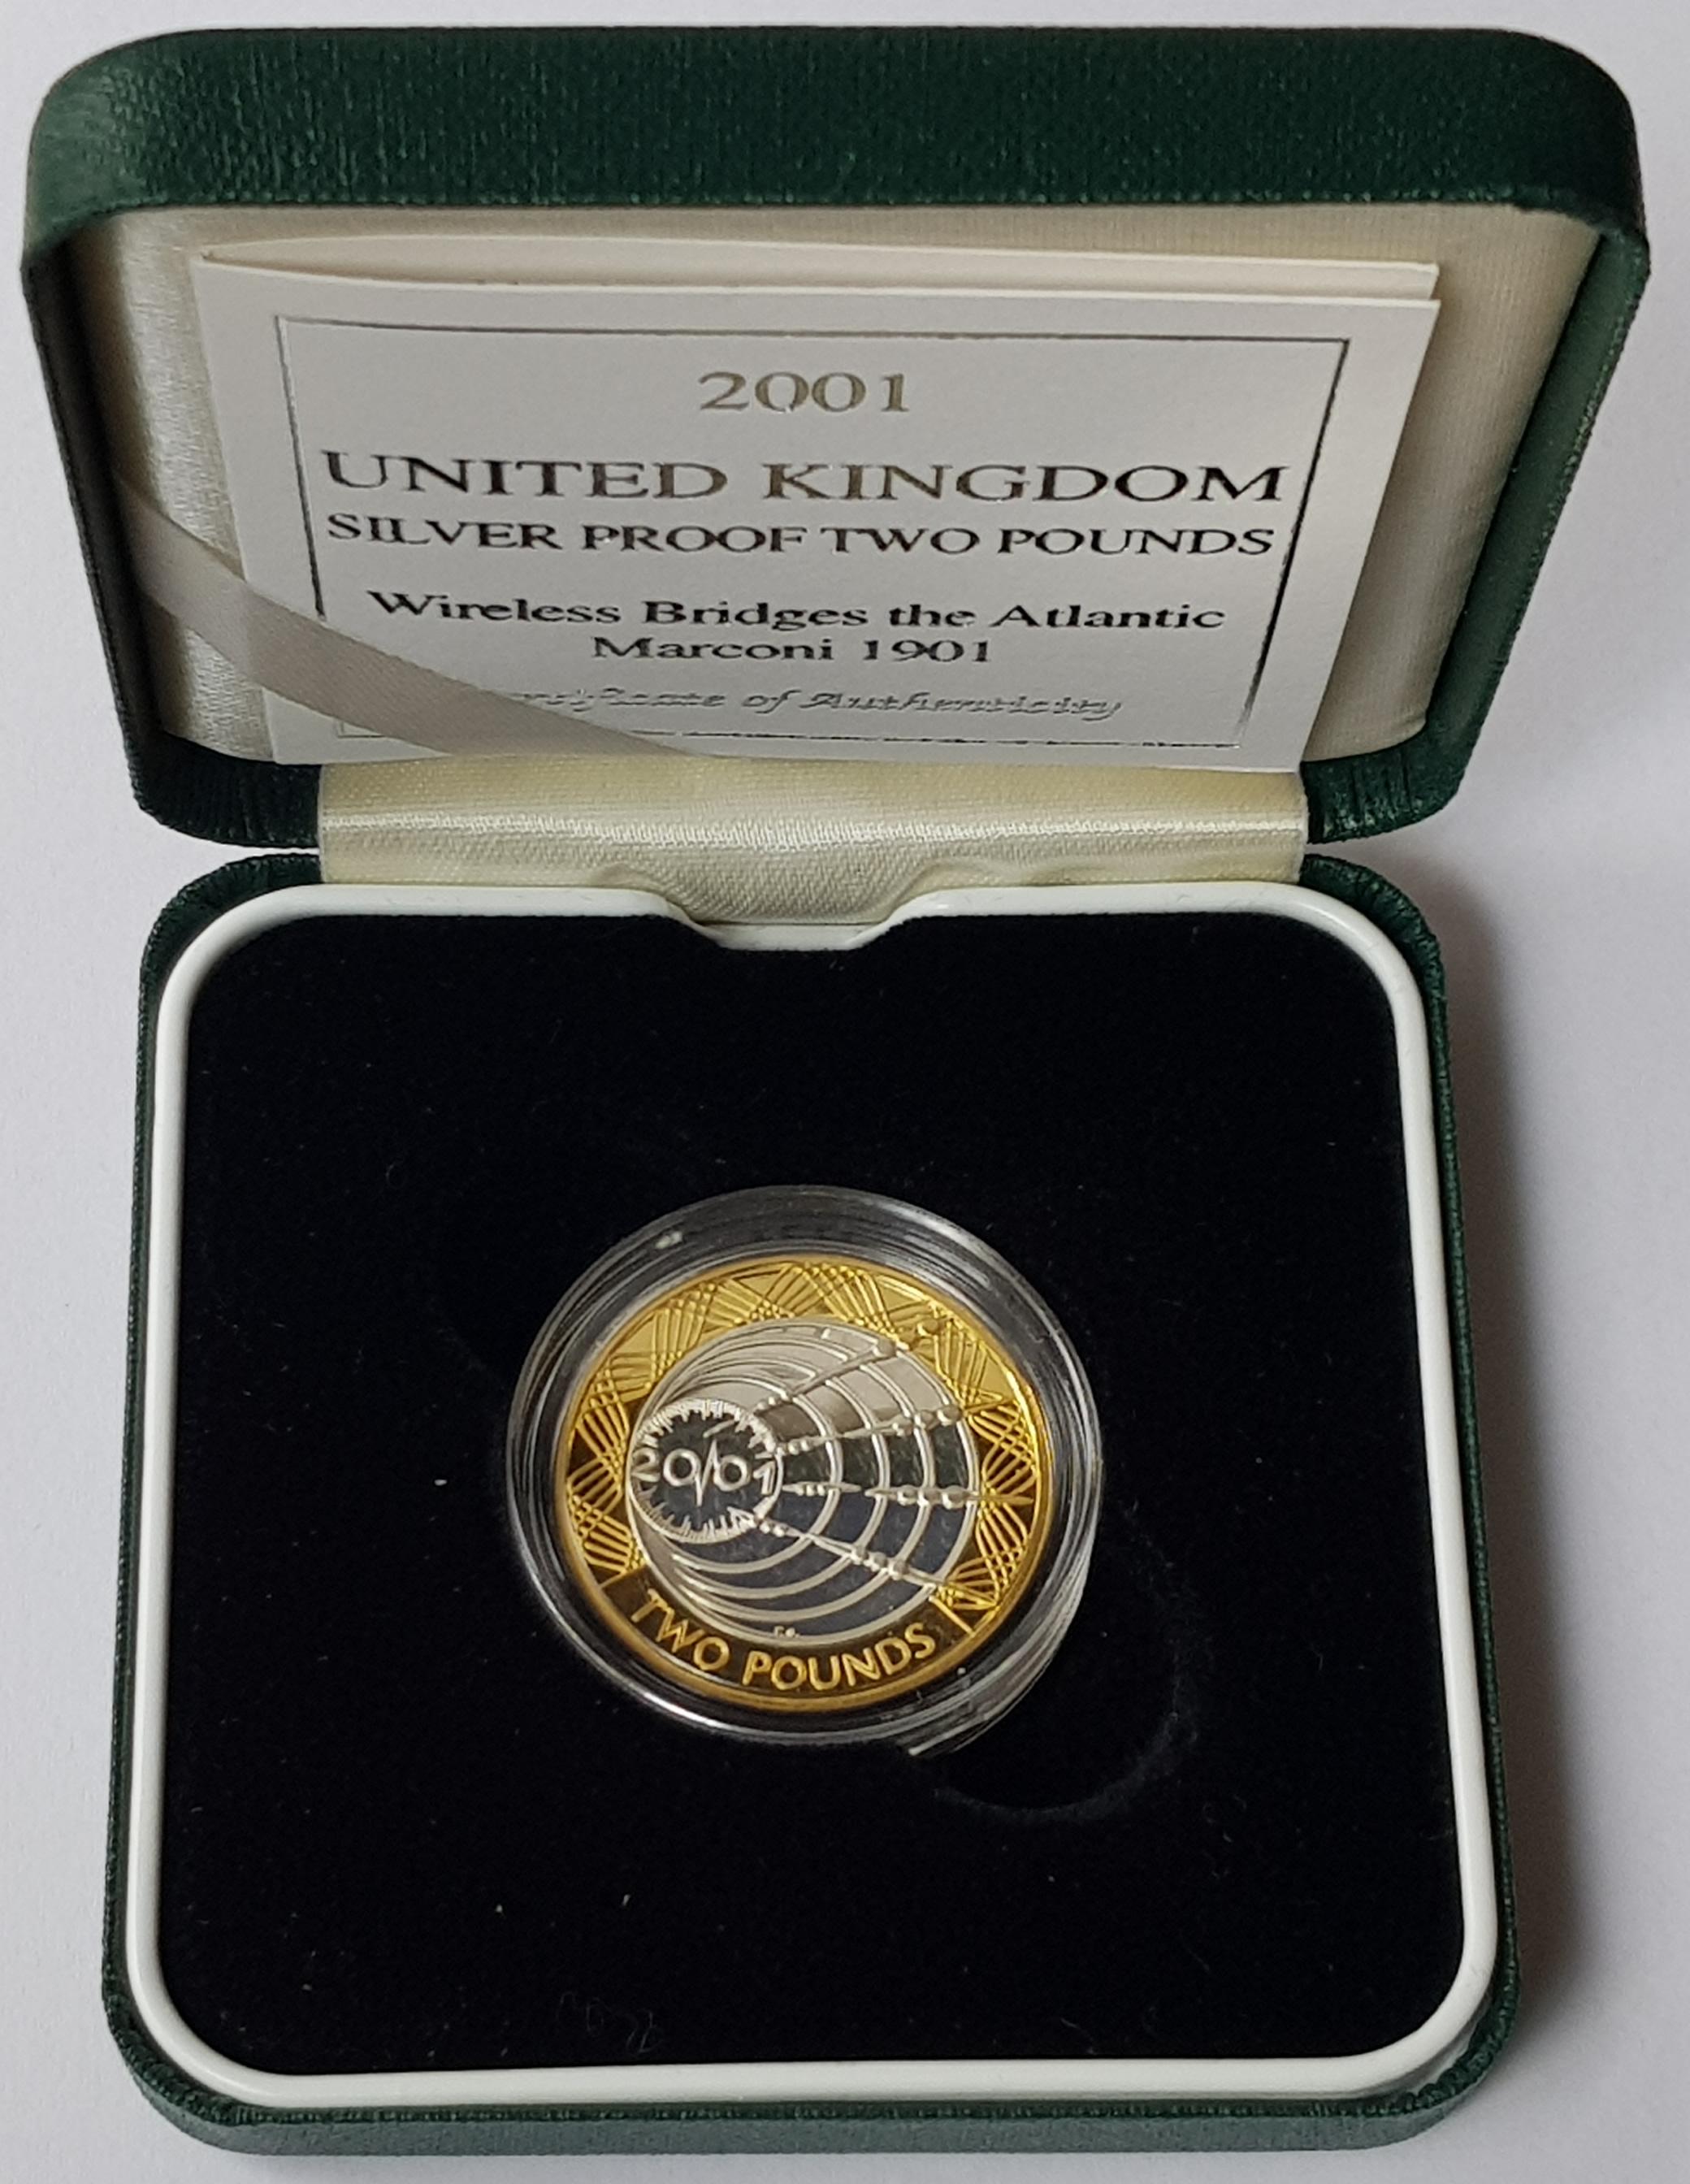 2001 United Kingdom Marconi Silver Proof 2 Coin